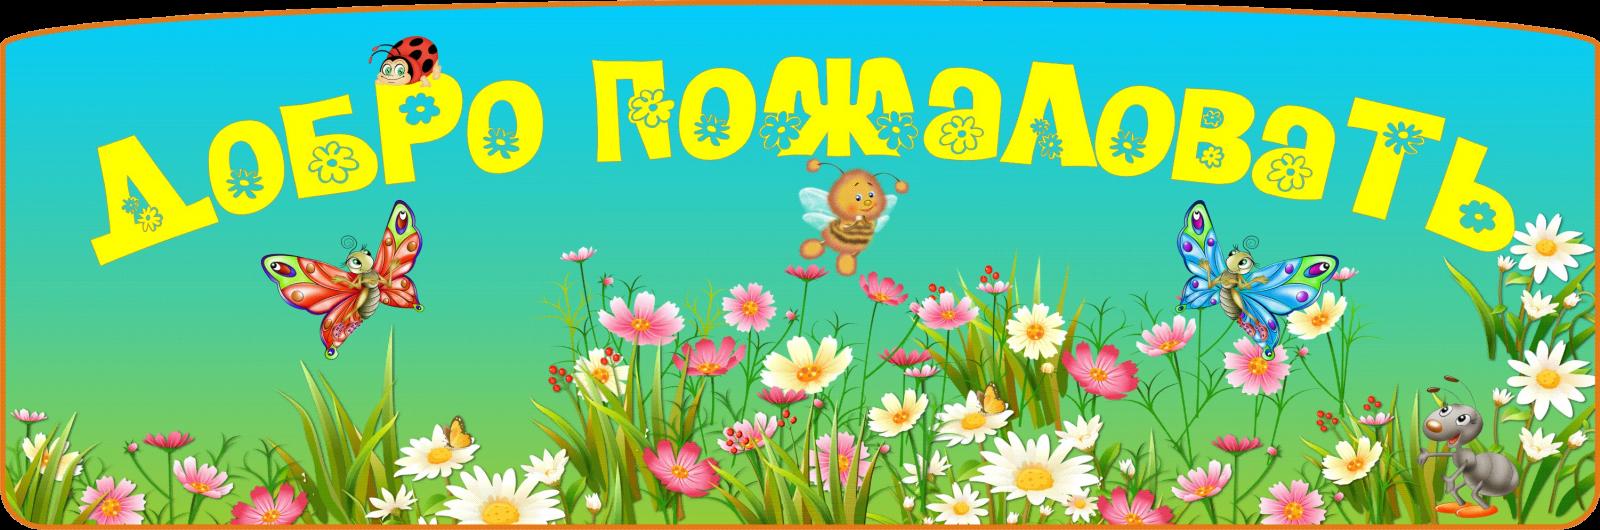 "МБДОУ ""ДС №277 г. Челябинска"